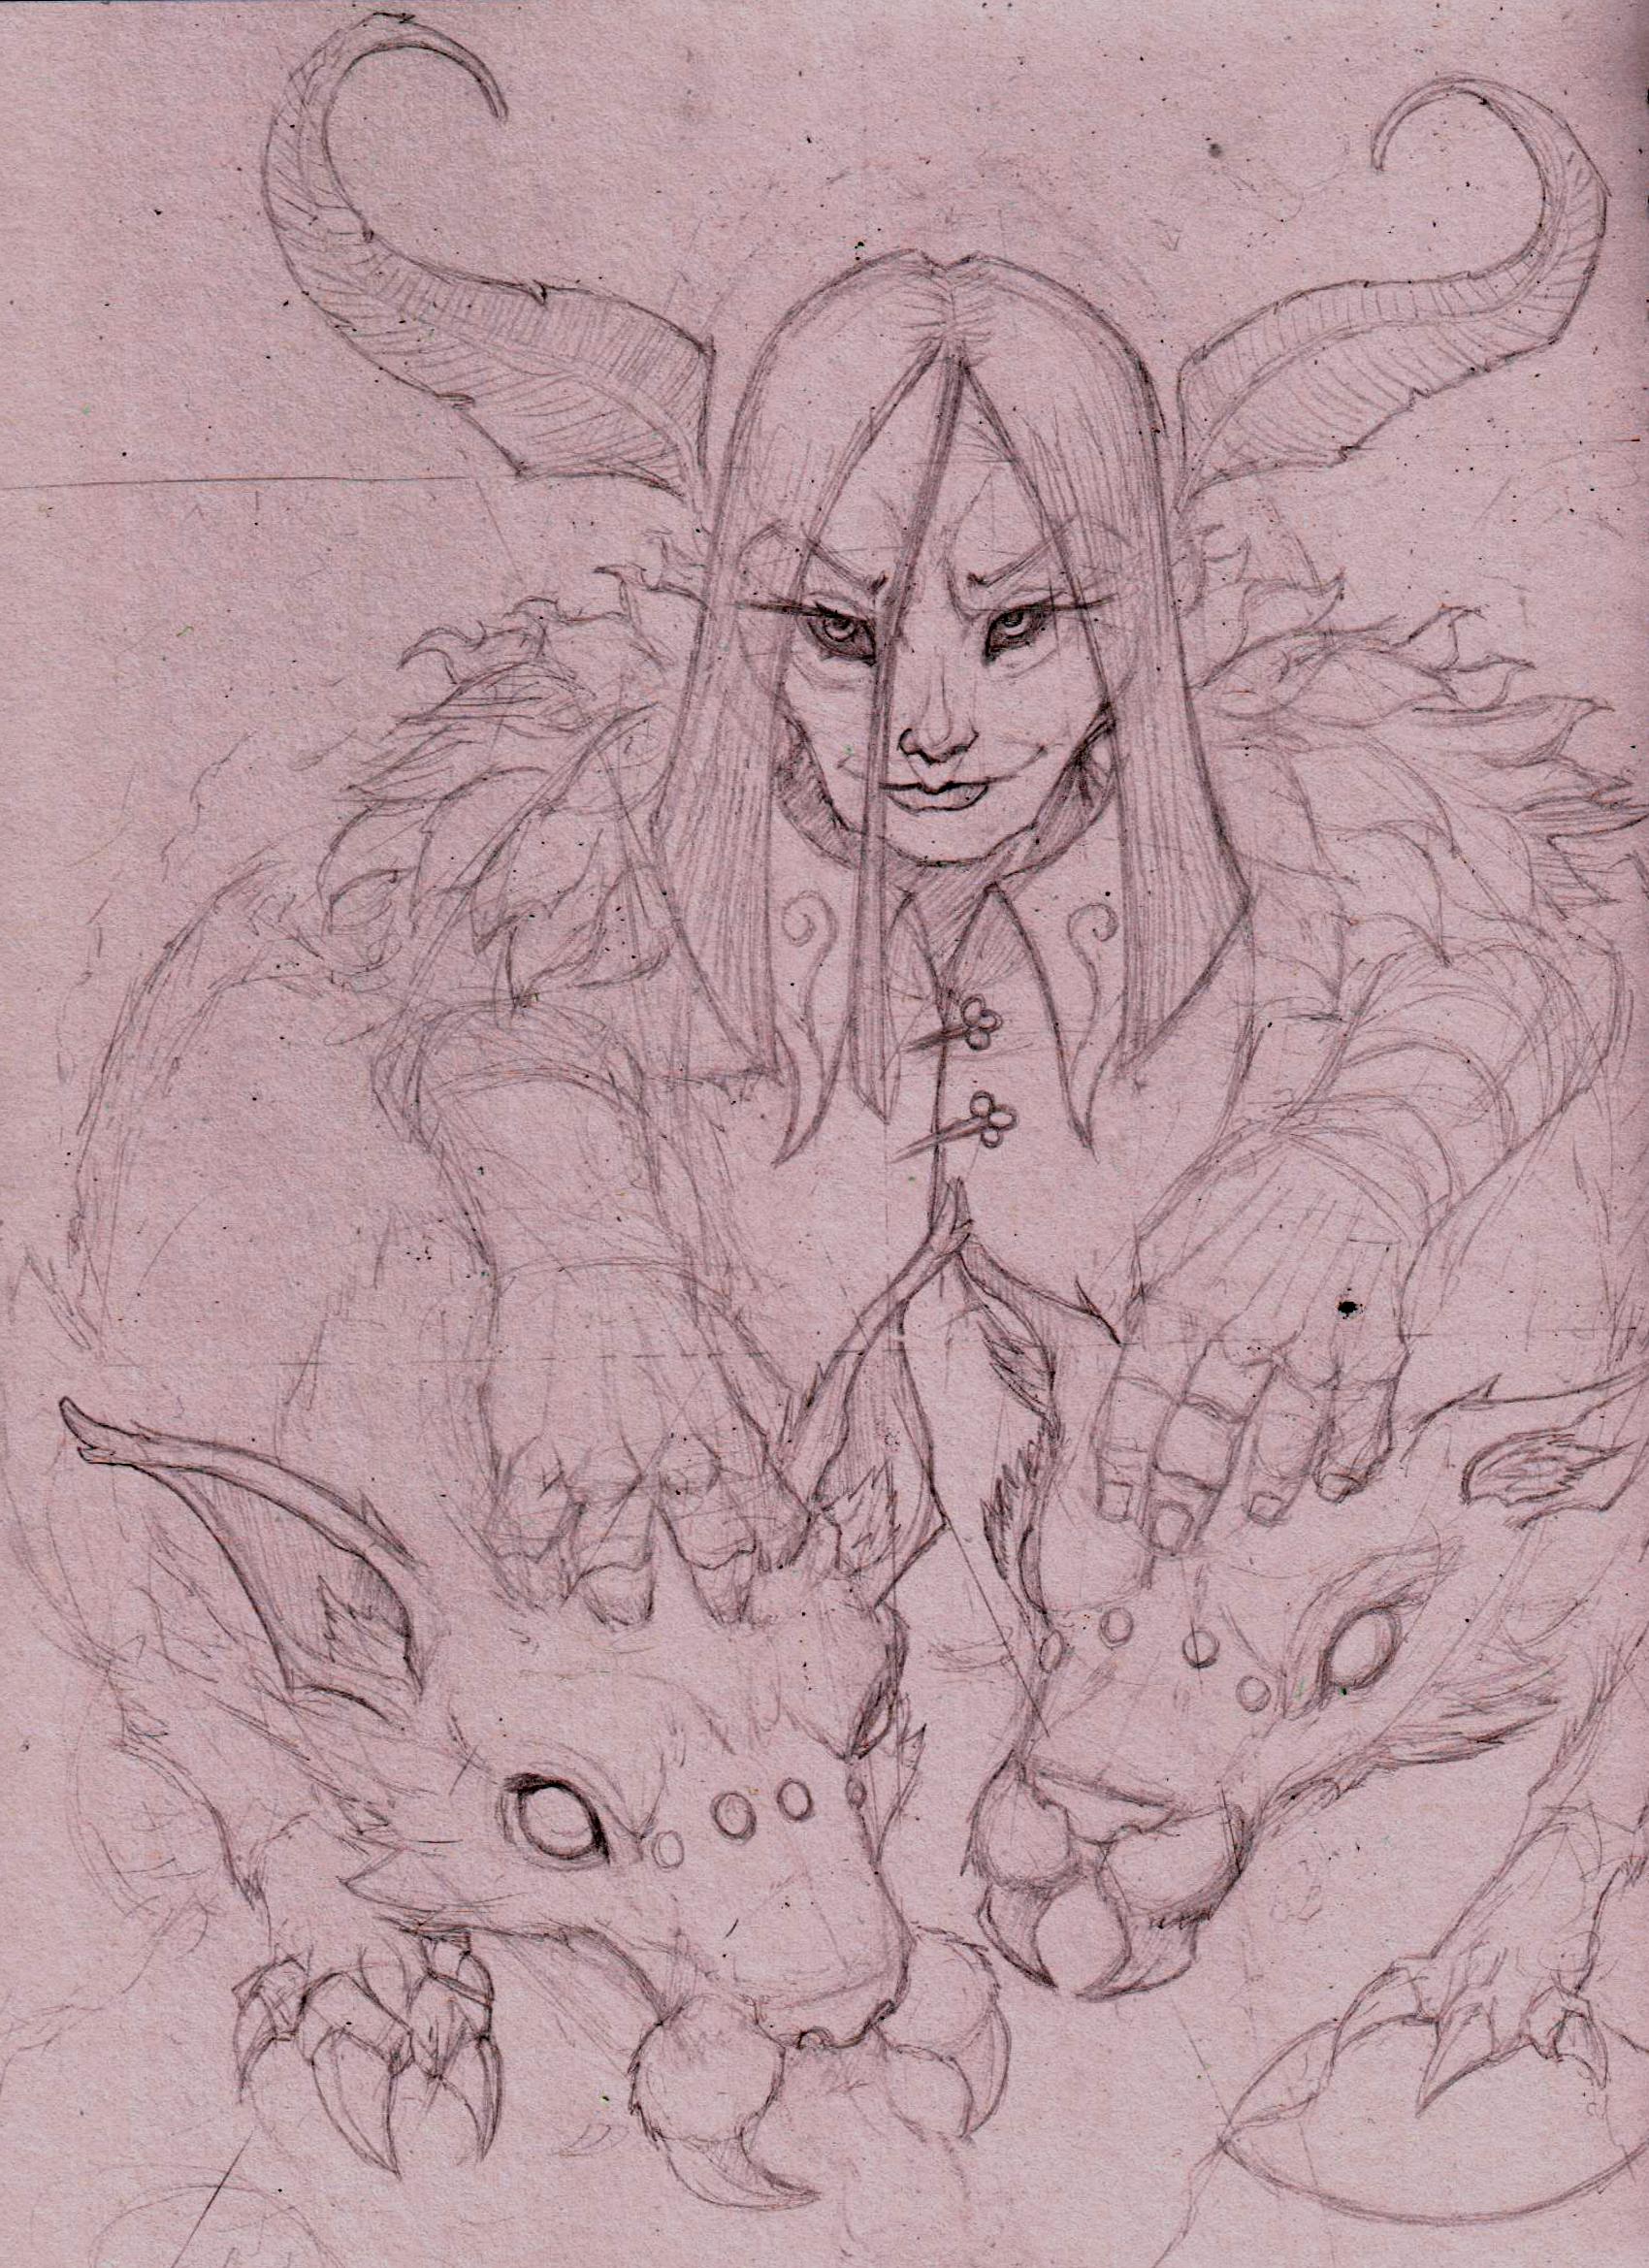 unseelie huntsman sketch